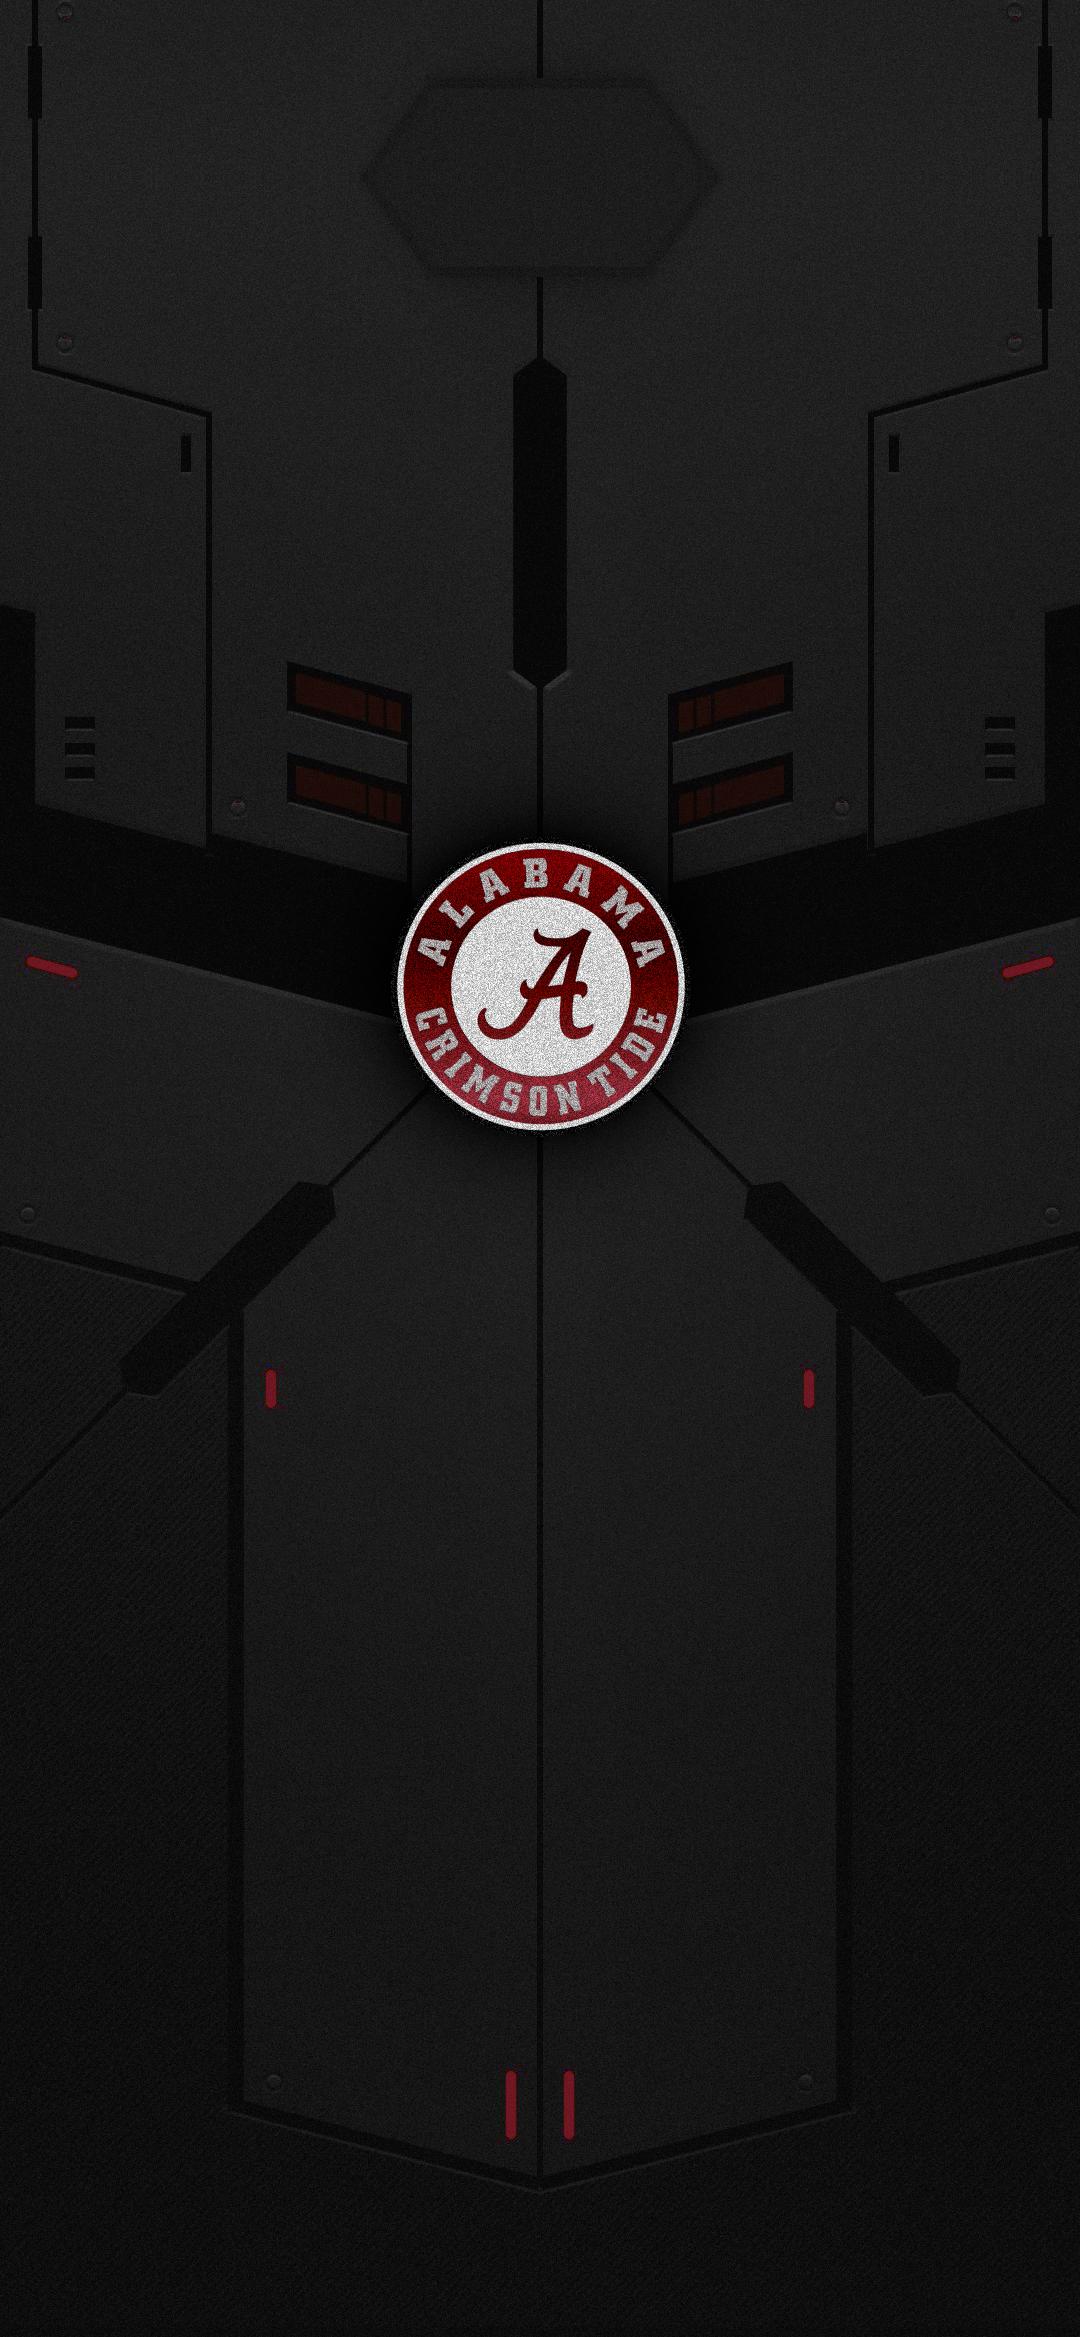 Bama Tek In 2020 Alabama Crimson Tide Crimson Tide Football Alabama Wallpaper